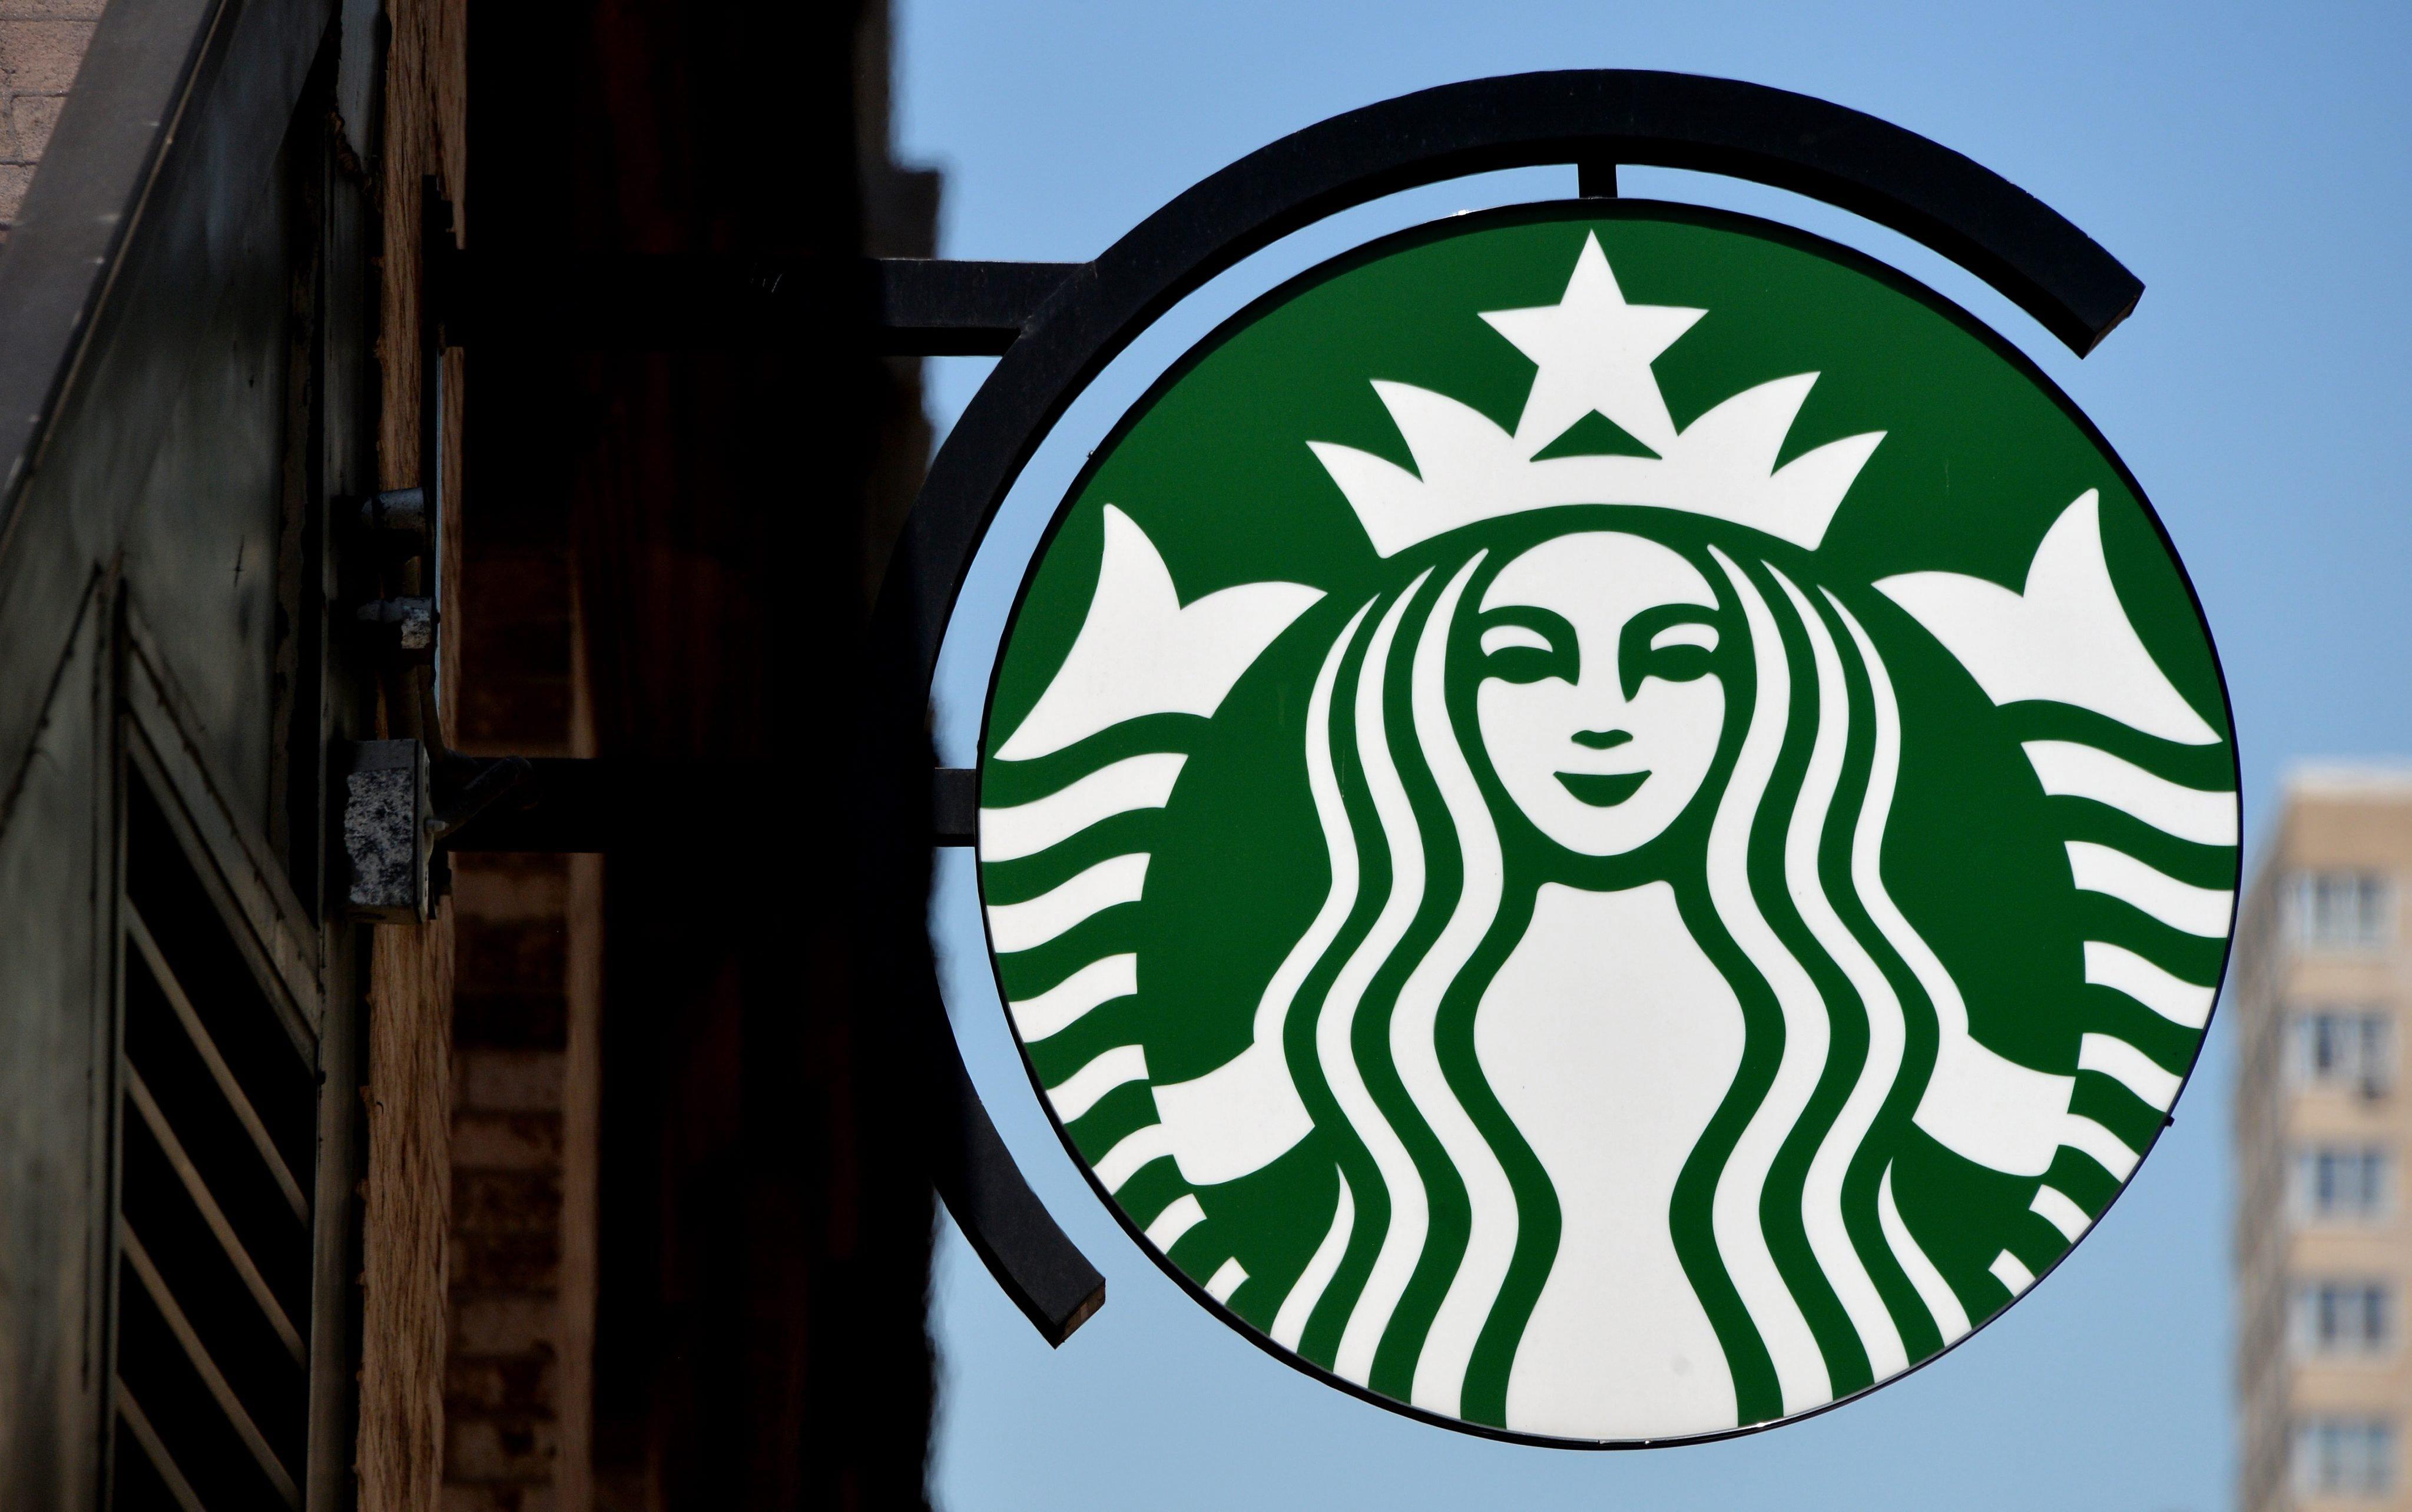 A Starbucks sign in New York City on June 16, 2014.